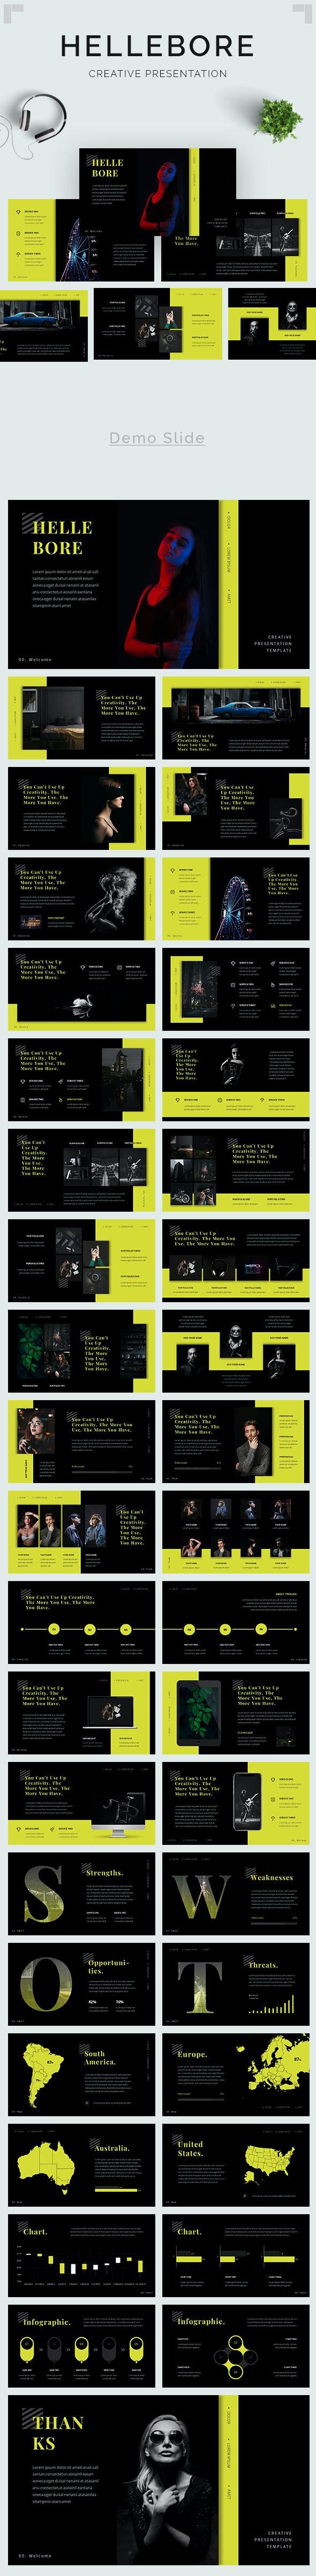 Hellebore - Creative Keynote Template - Creative Keynote Templates